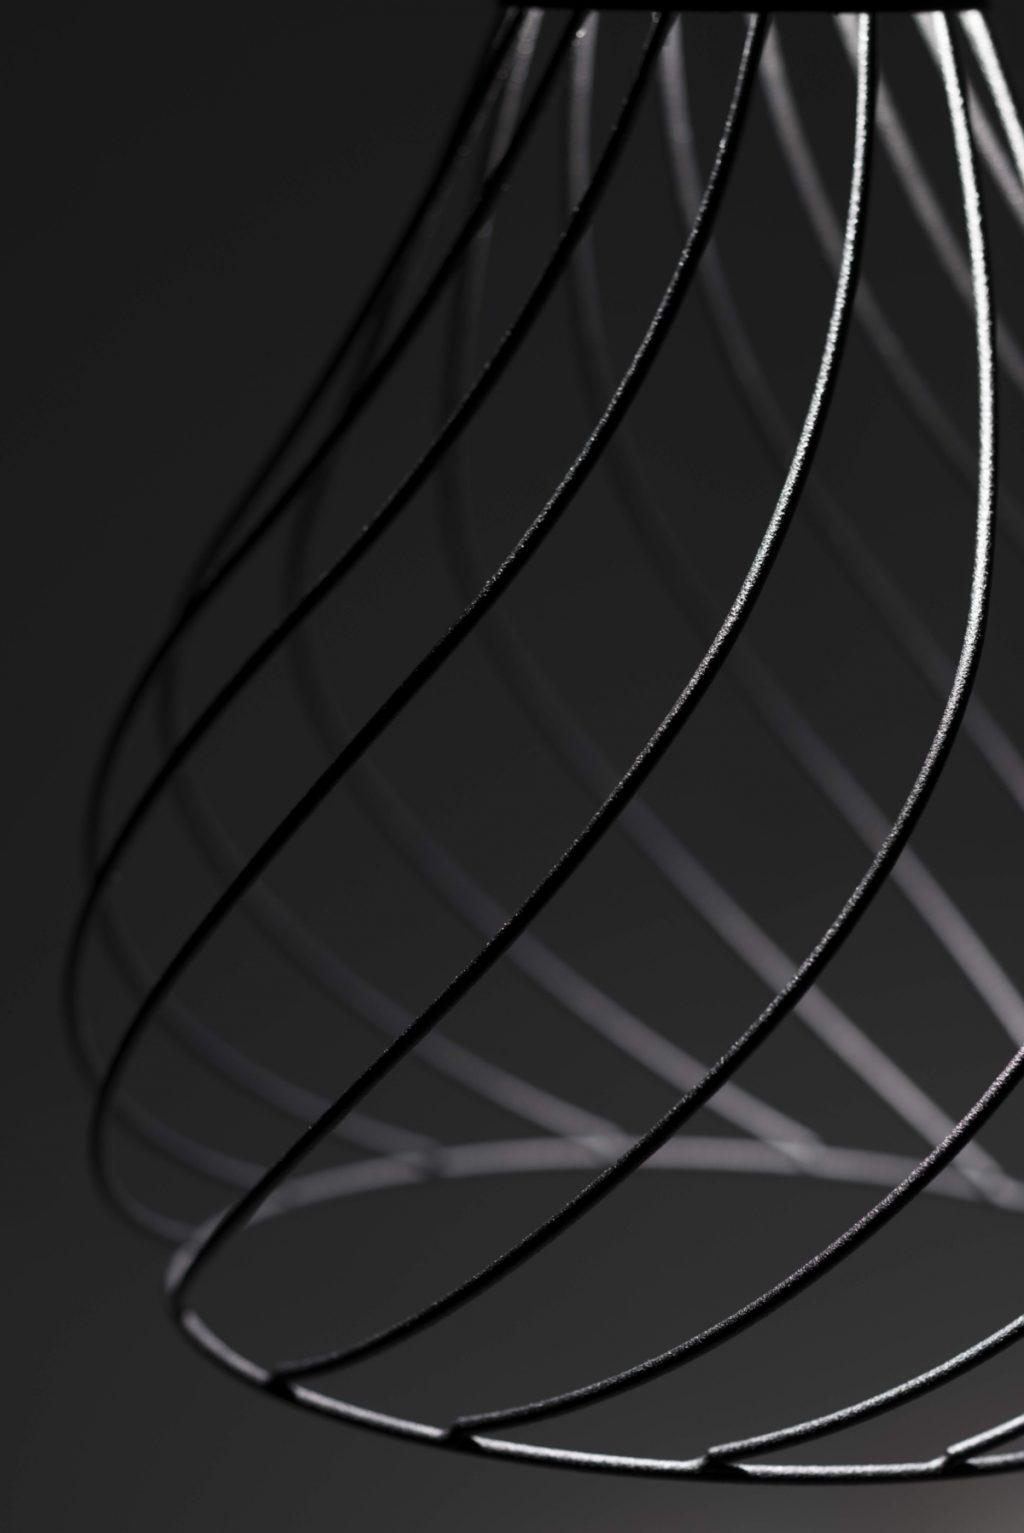 araña suspendida Mongolfier de la Línea Negro Light Group, detalle